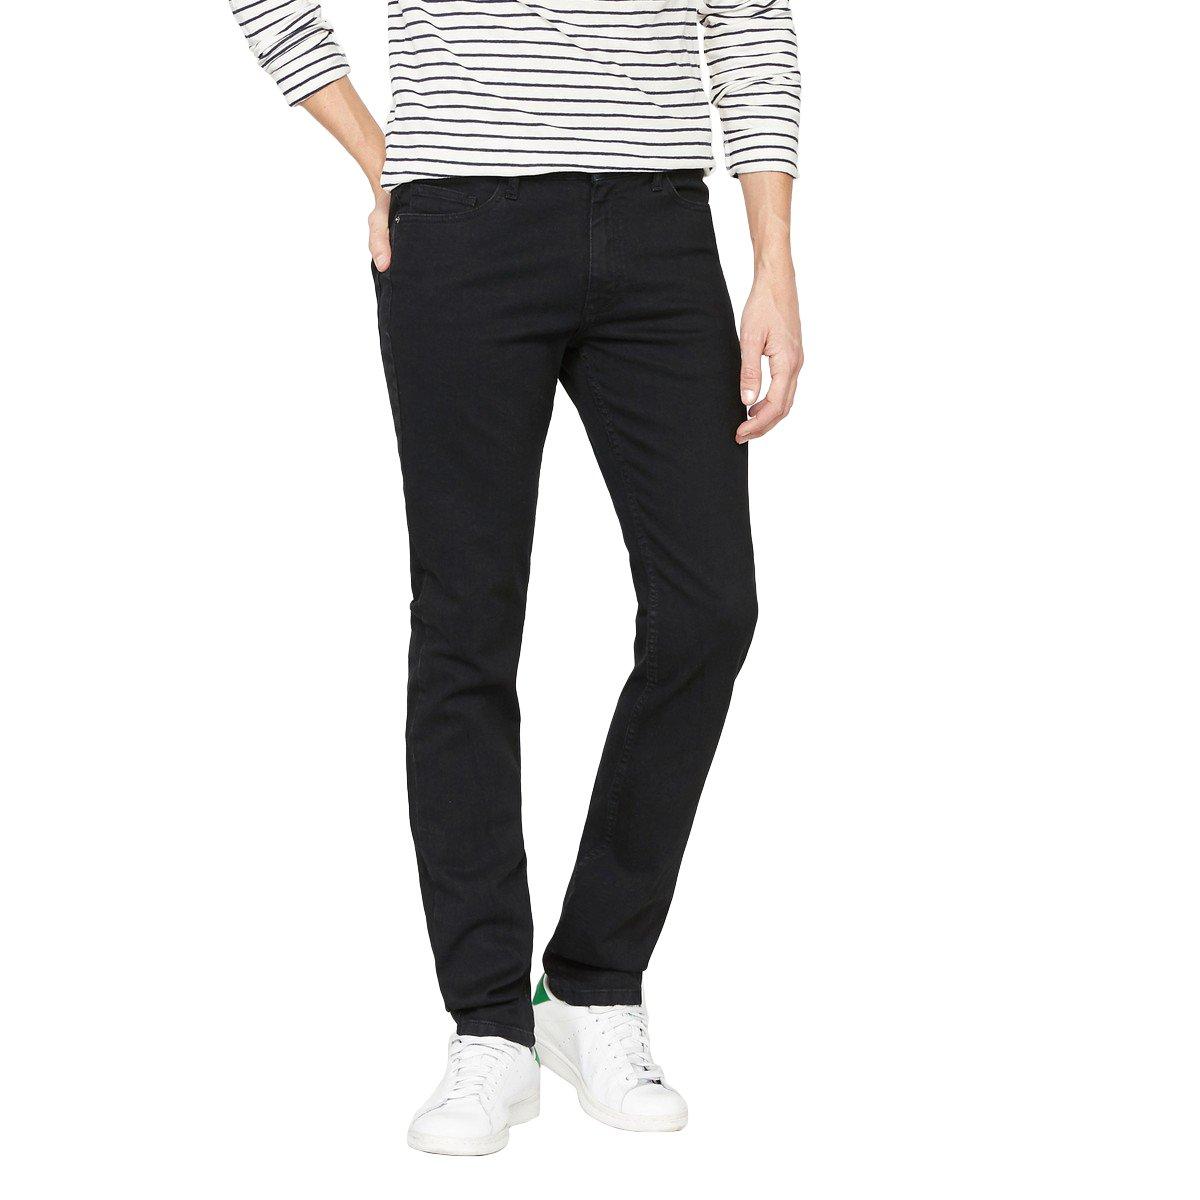 La Redoute Uniross Mens Slim-Fit Stretch Denim Jeans